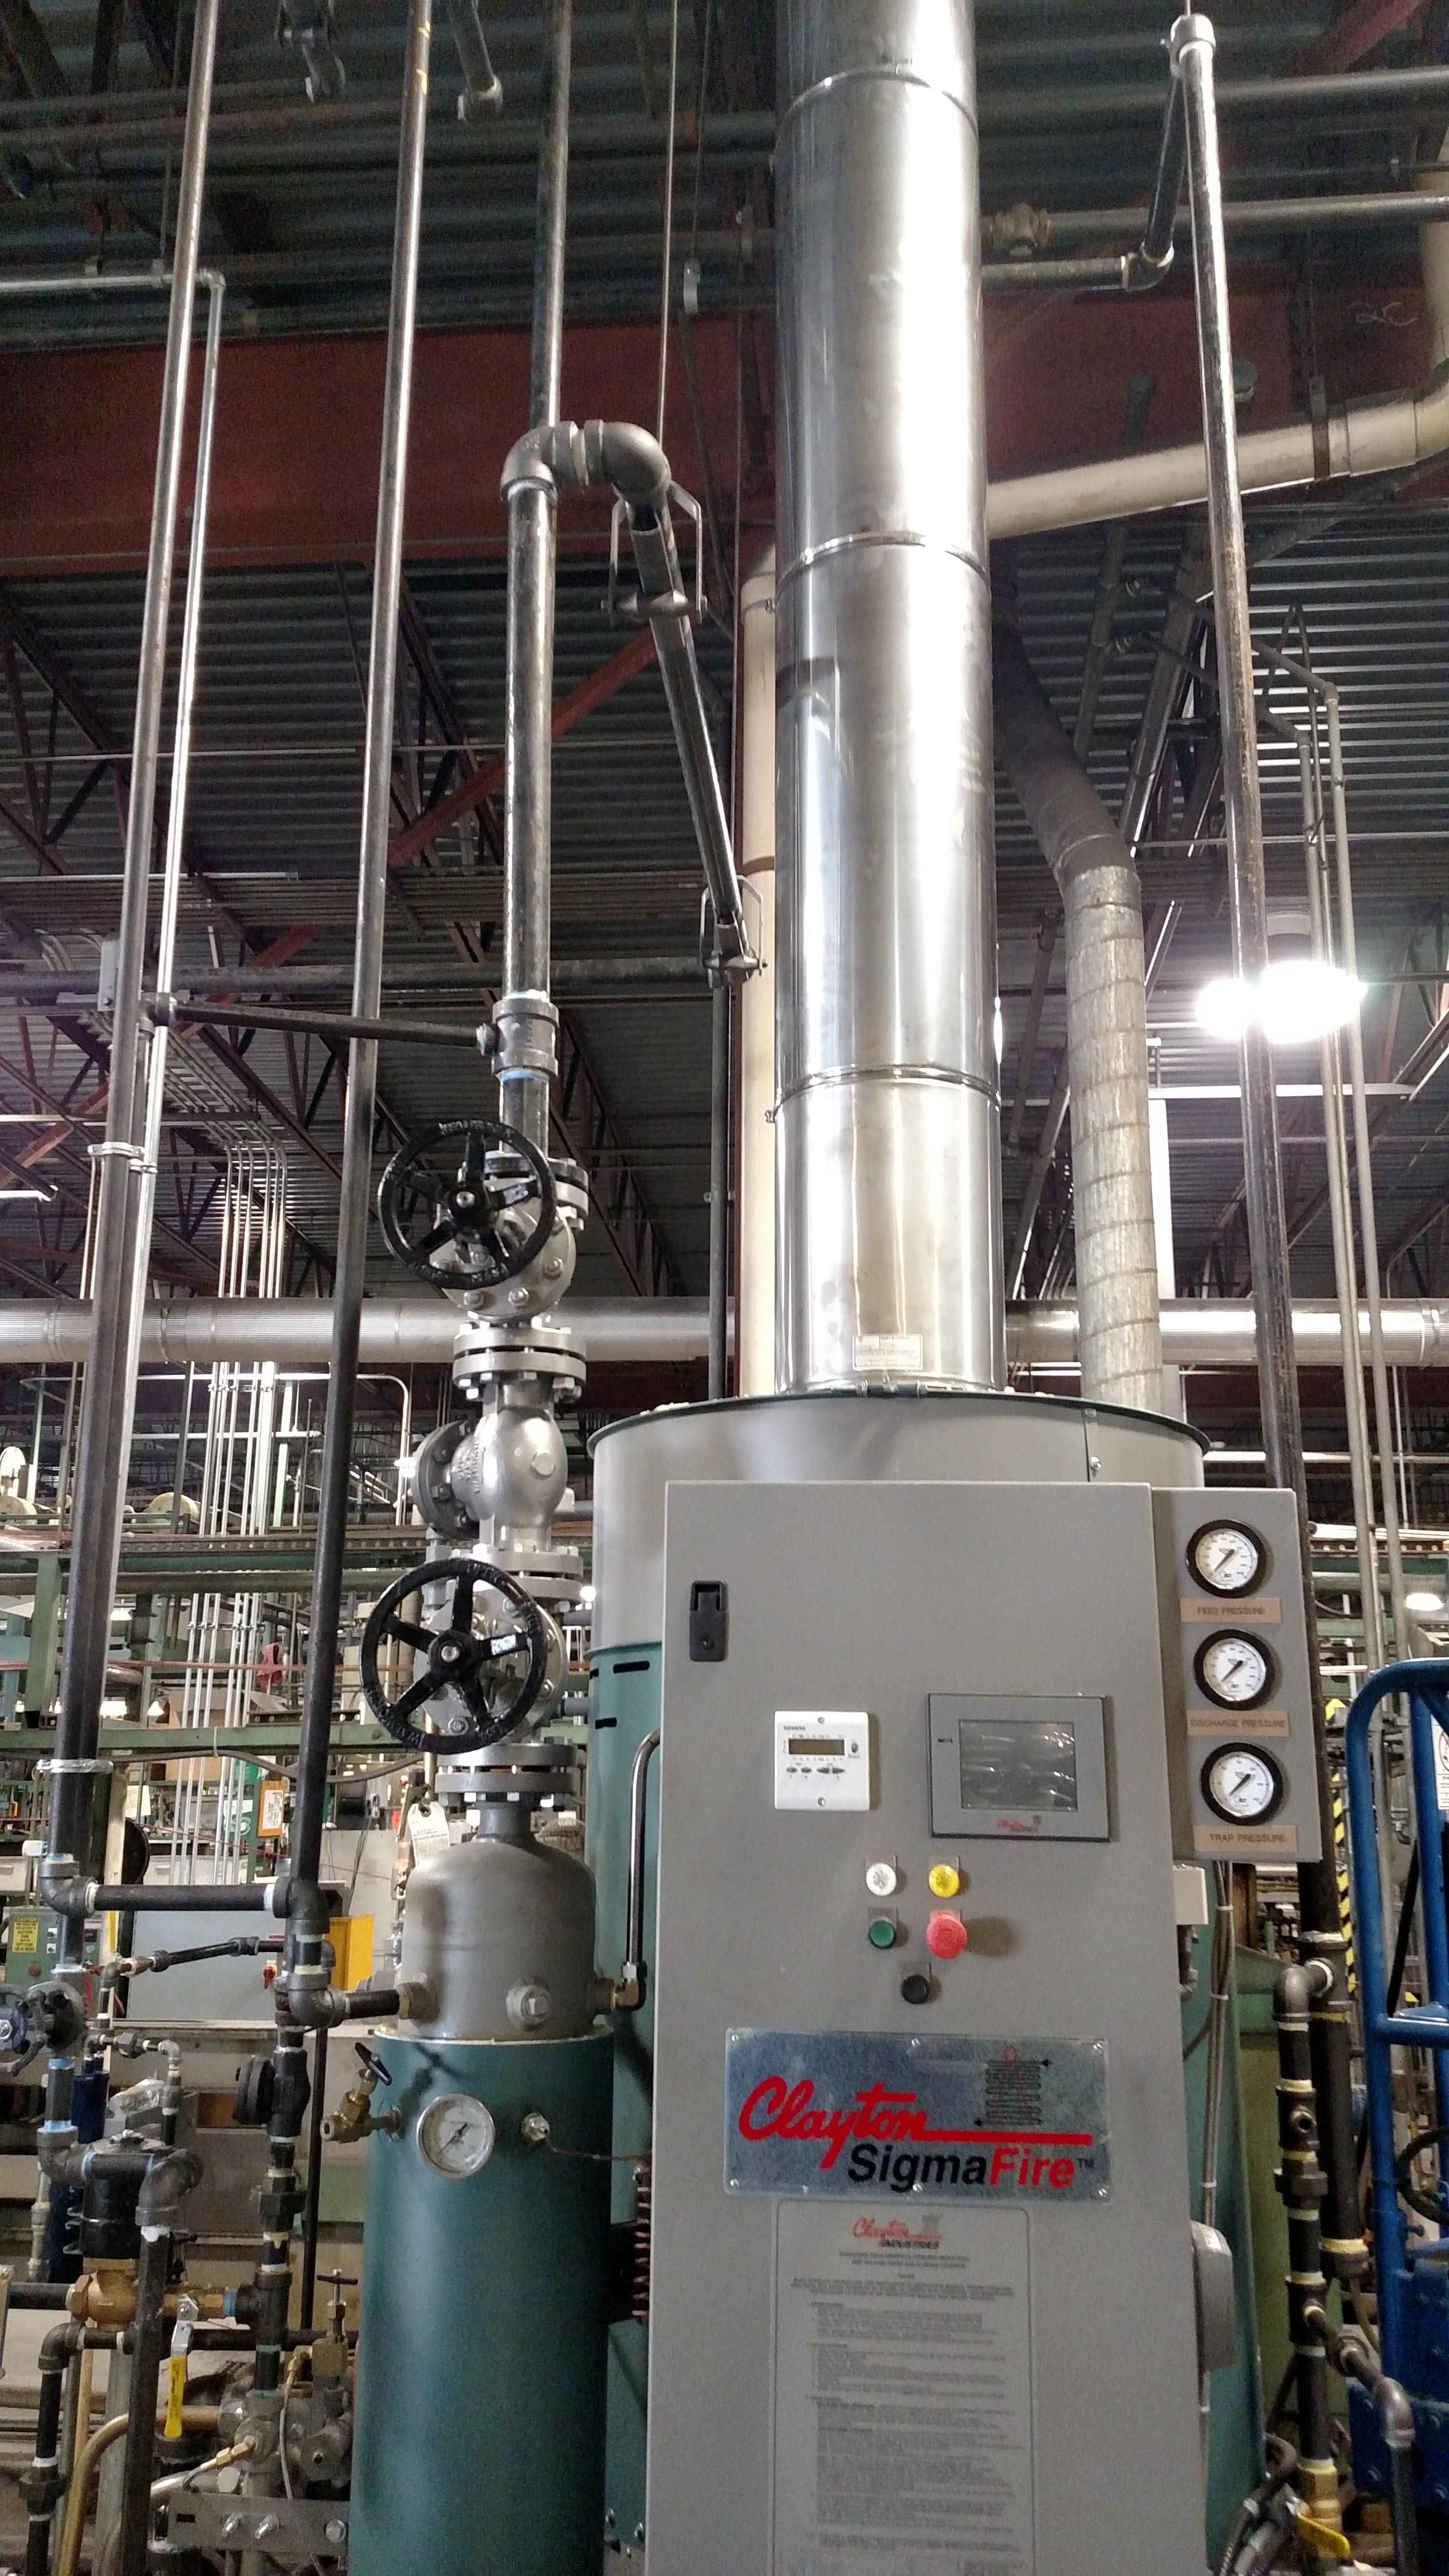 piping clayton steam generator install